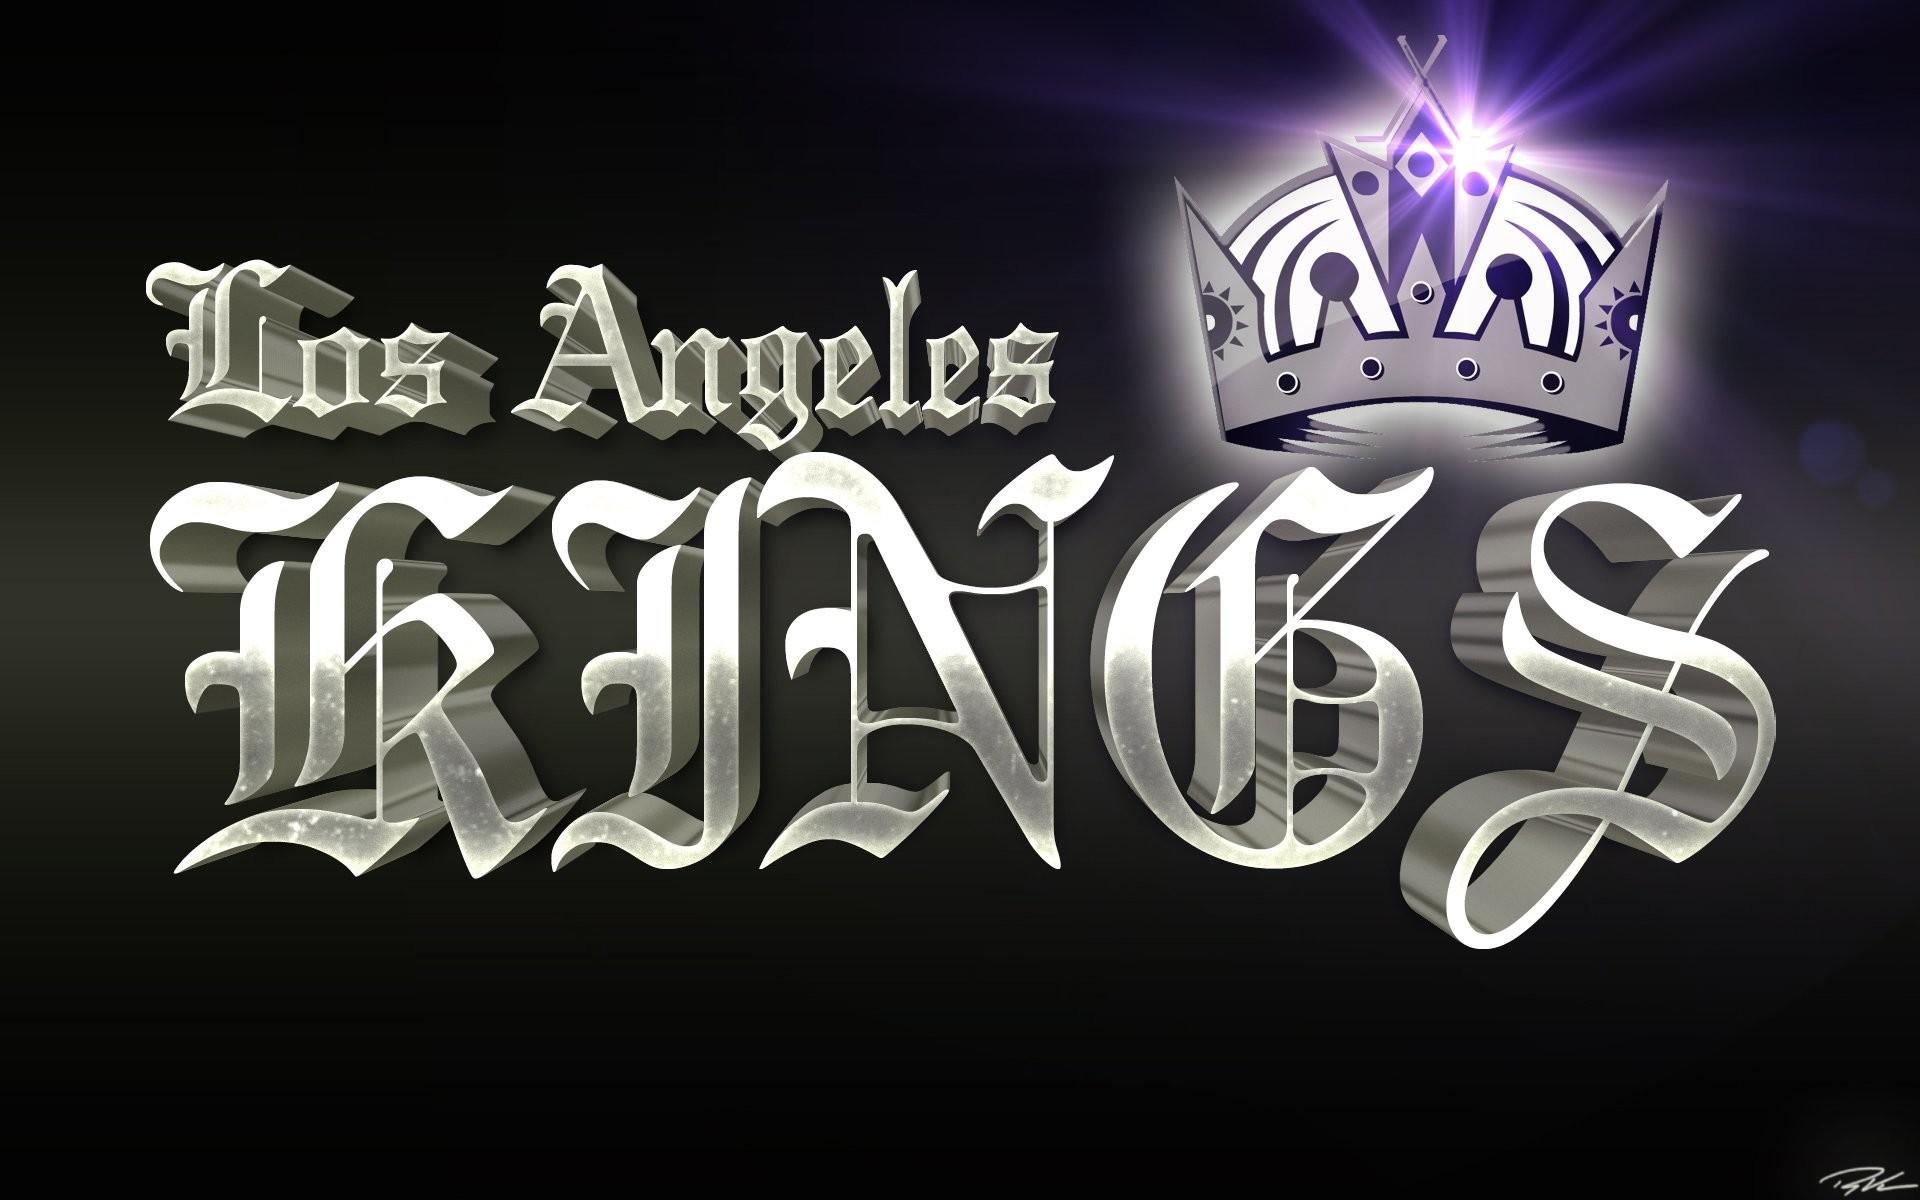 free la kings logo wallpaper hd wallpapers background photos apple tablet best  wallpaper ever free download